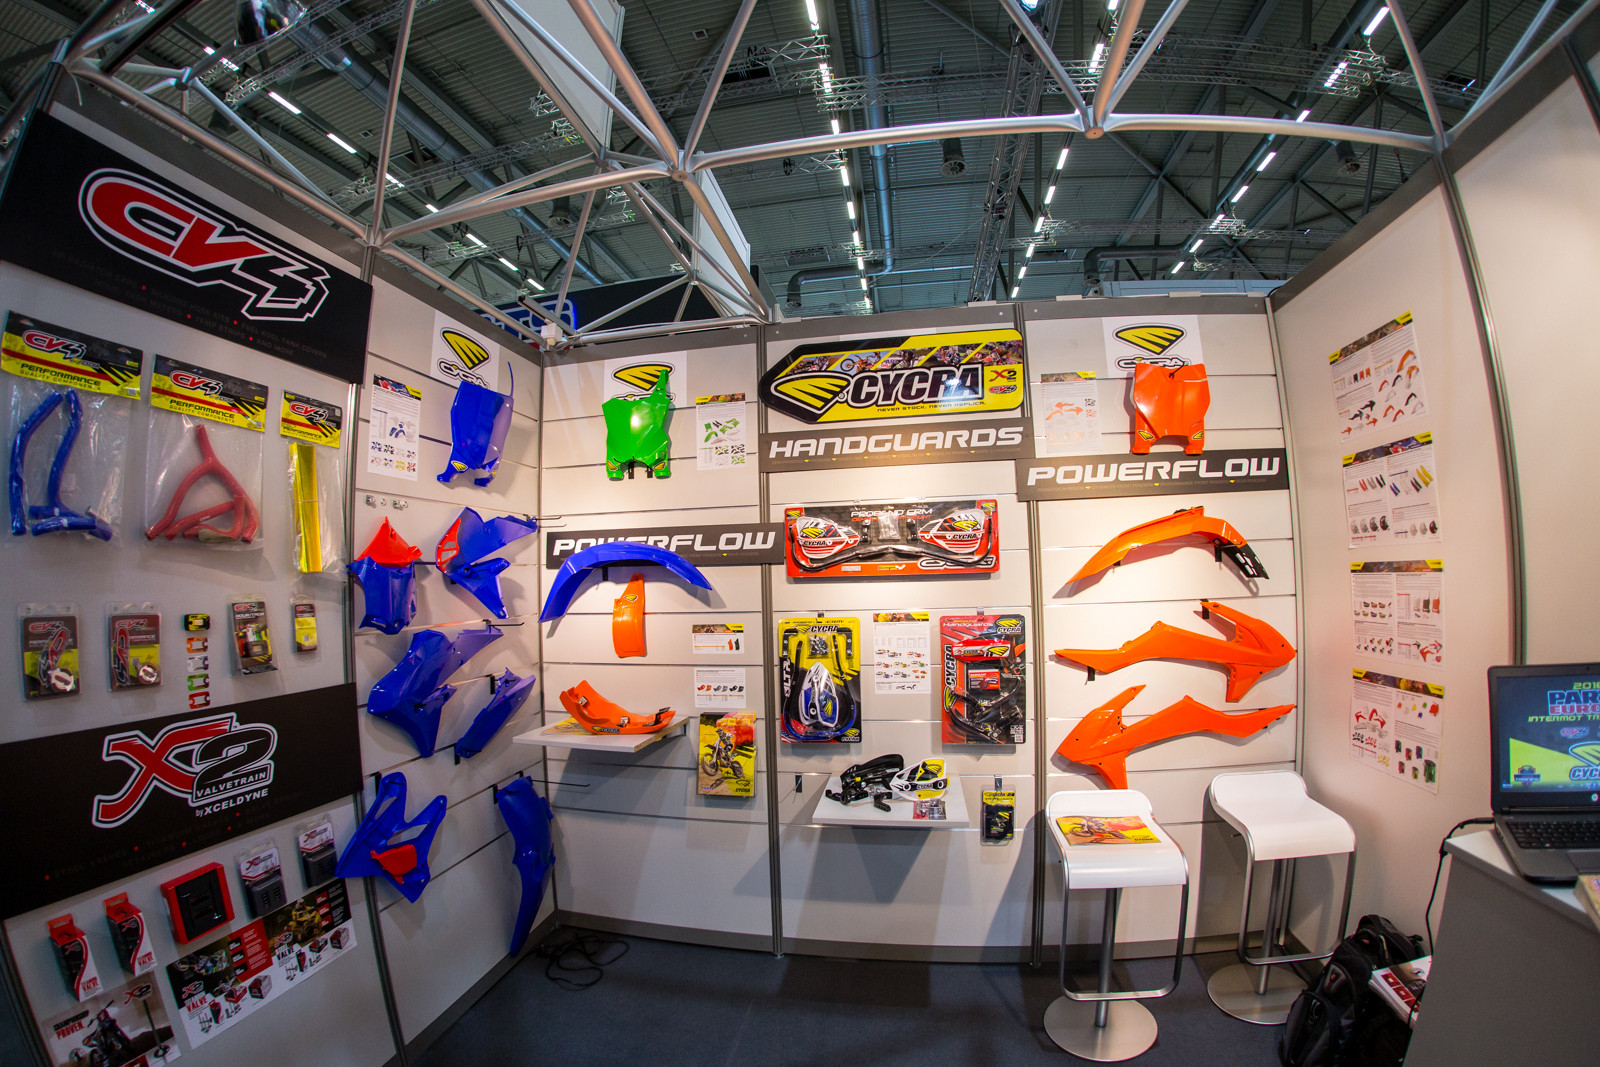 Cycra - 2016 INTERMOT: Day 1 Coverage - Motocross Pictures - Vital MX